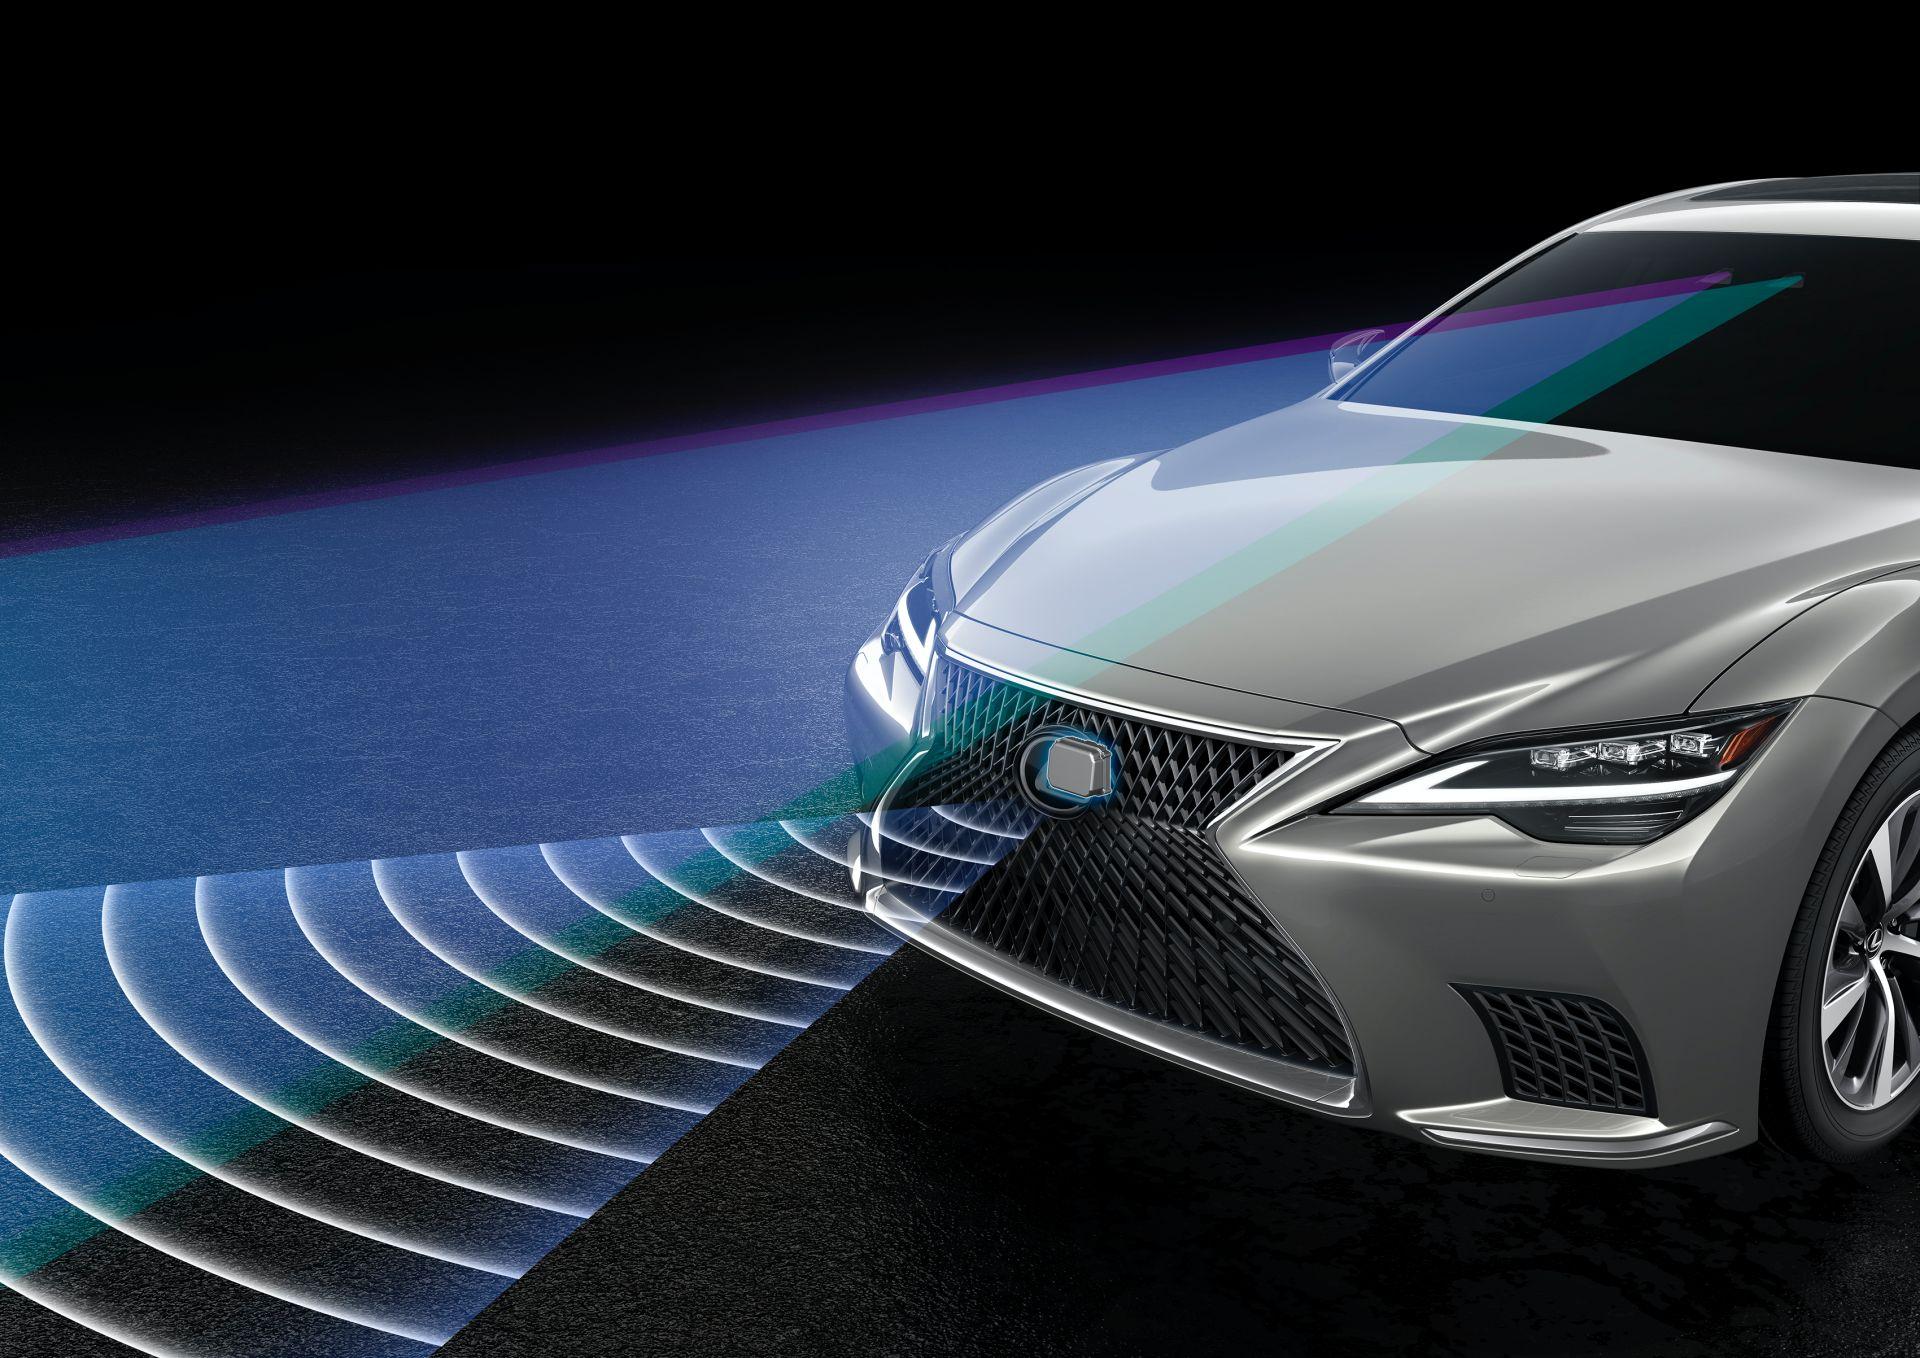 2021-Lexus-LS-facelift-56-1